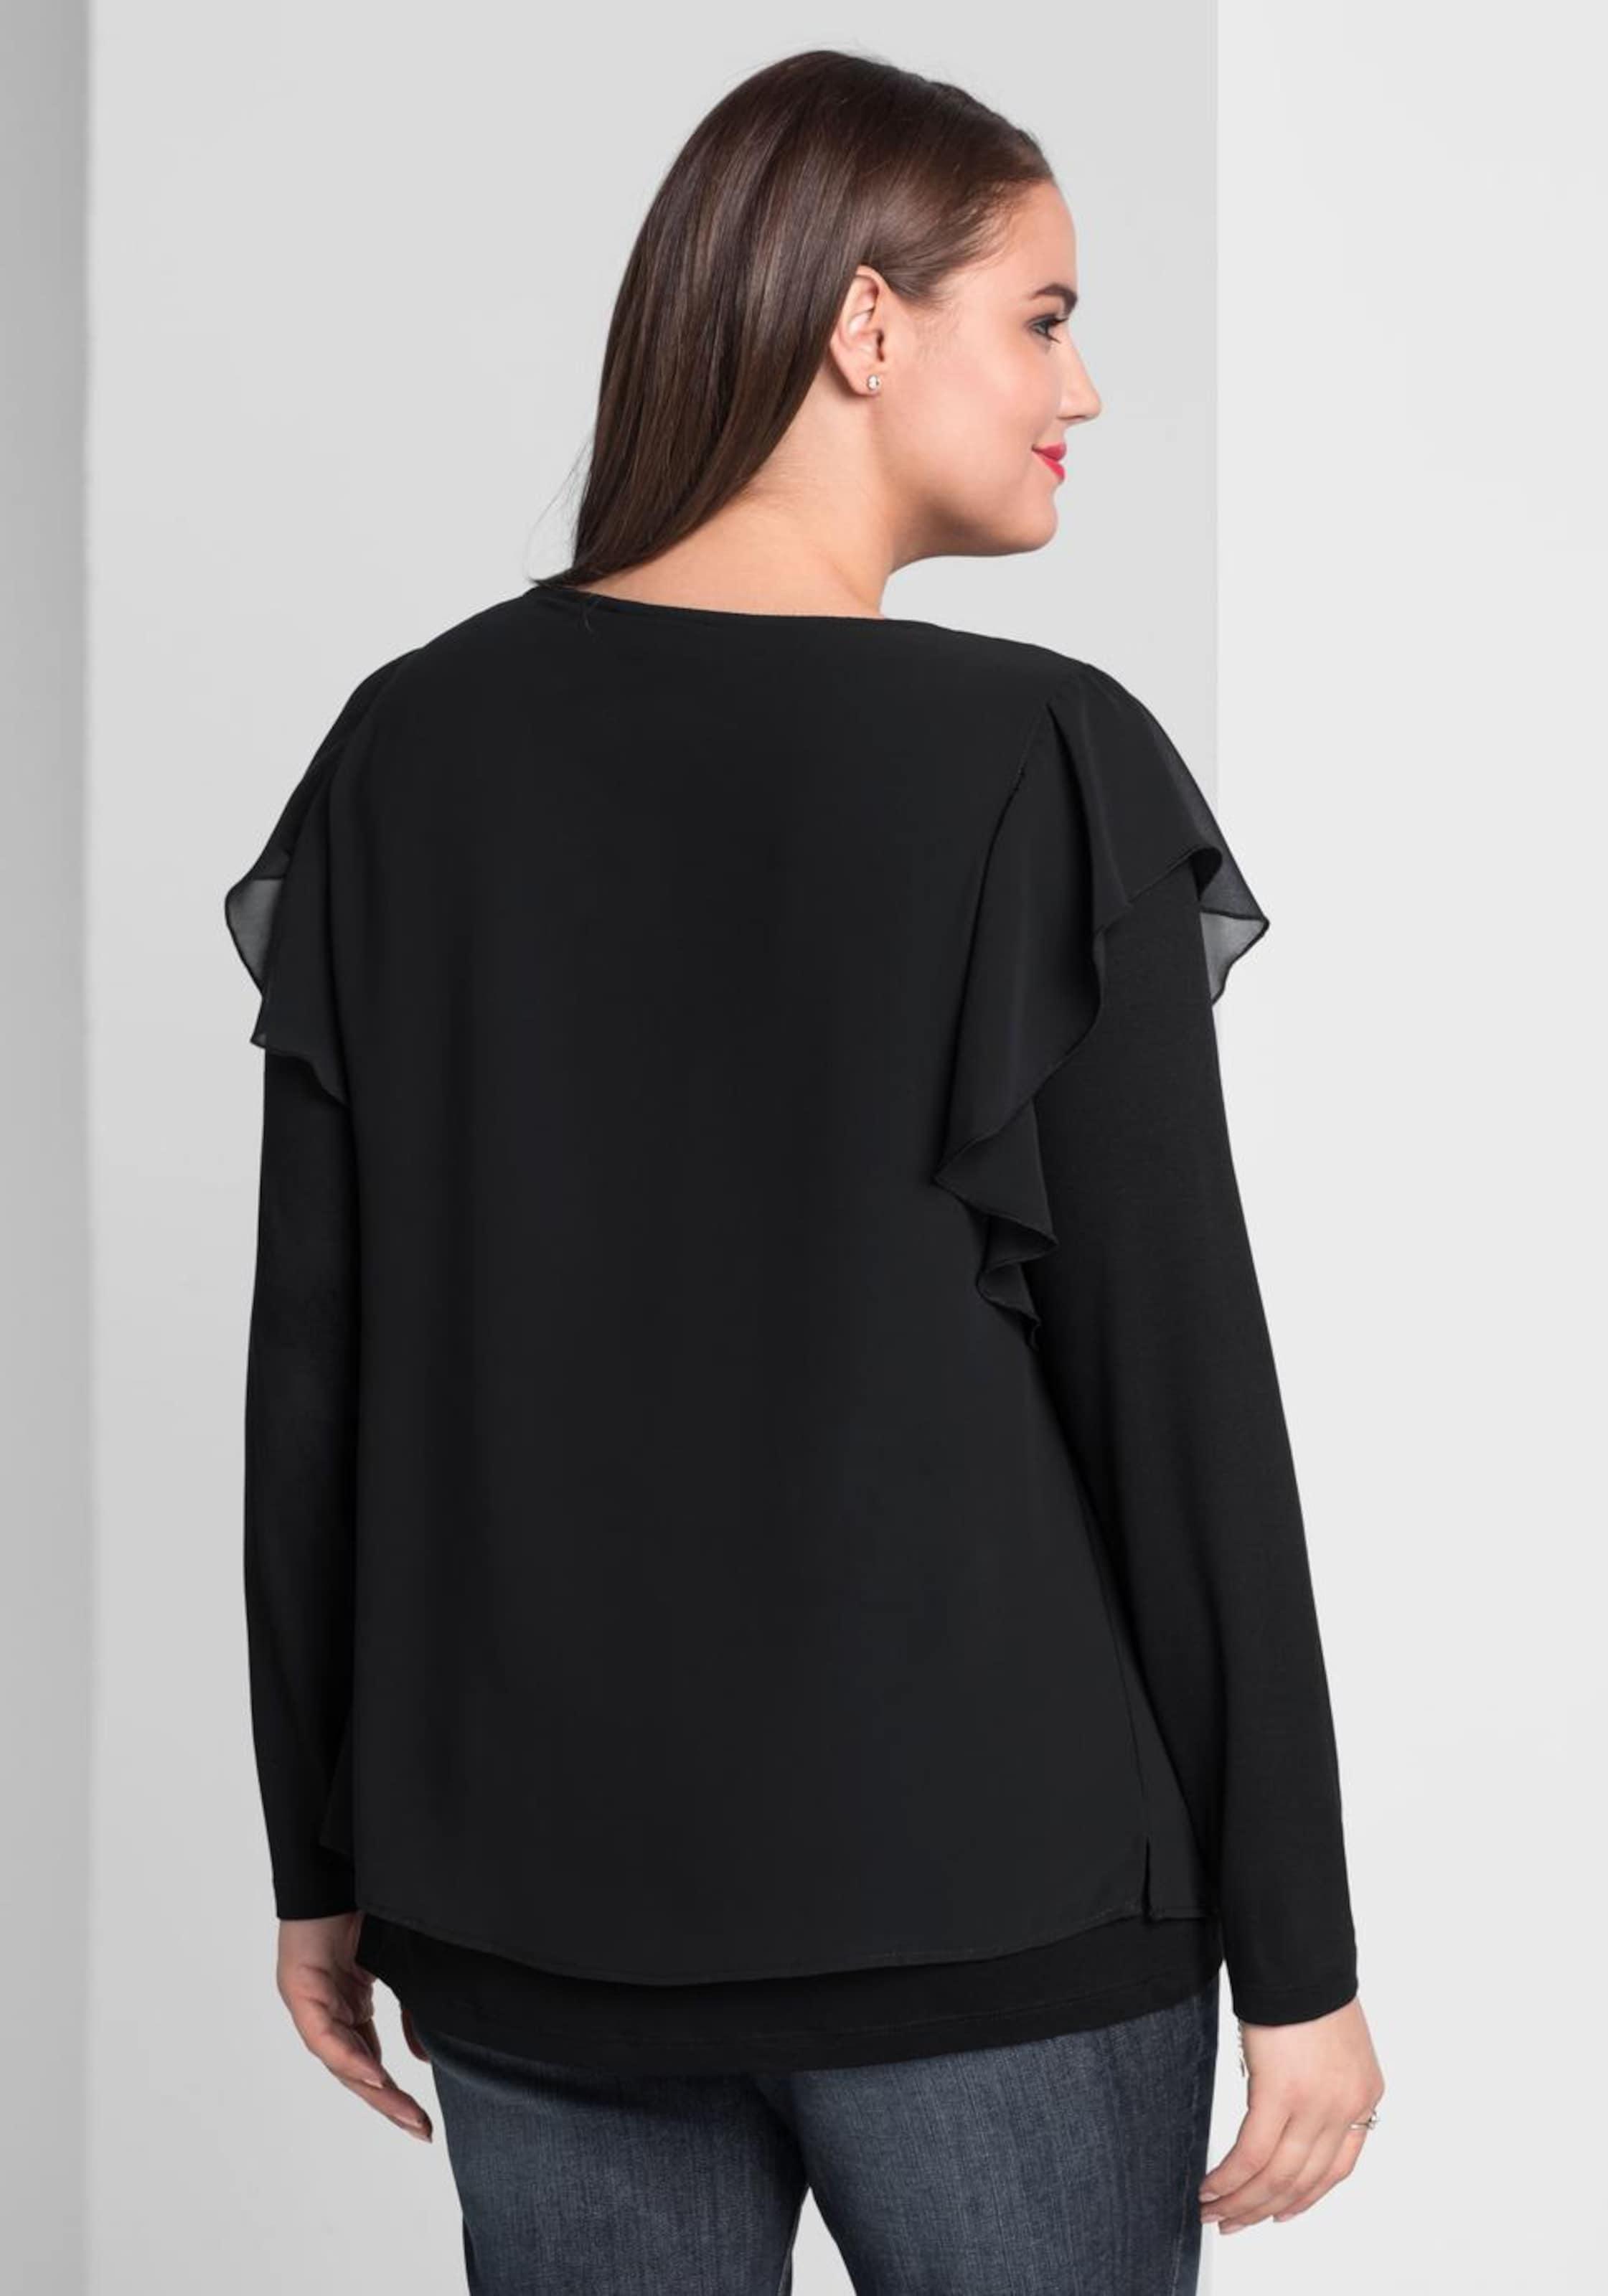 Shirt Shirt Sheego Schwarz Shirt In Schwarz In Sheego Schwarz Sheego Sheego In FcuTlK13J